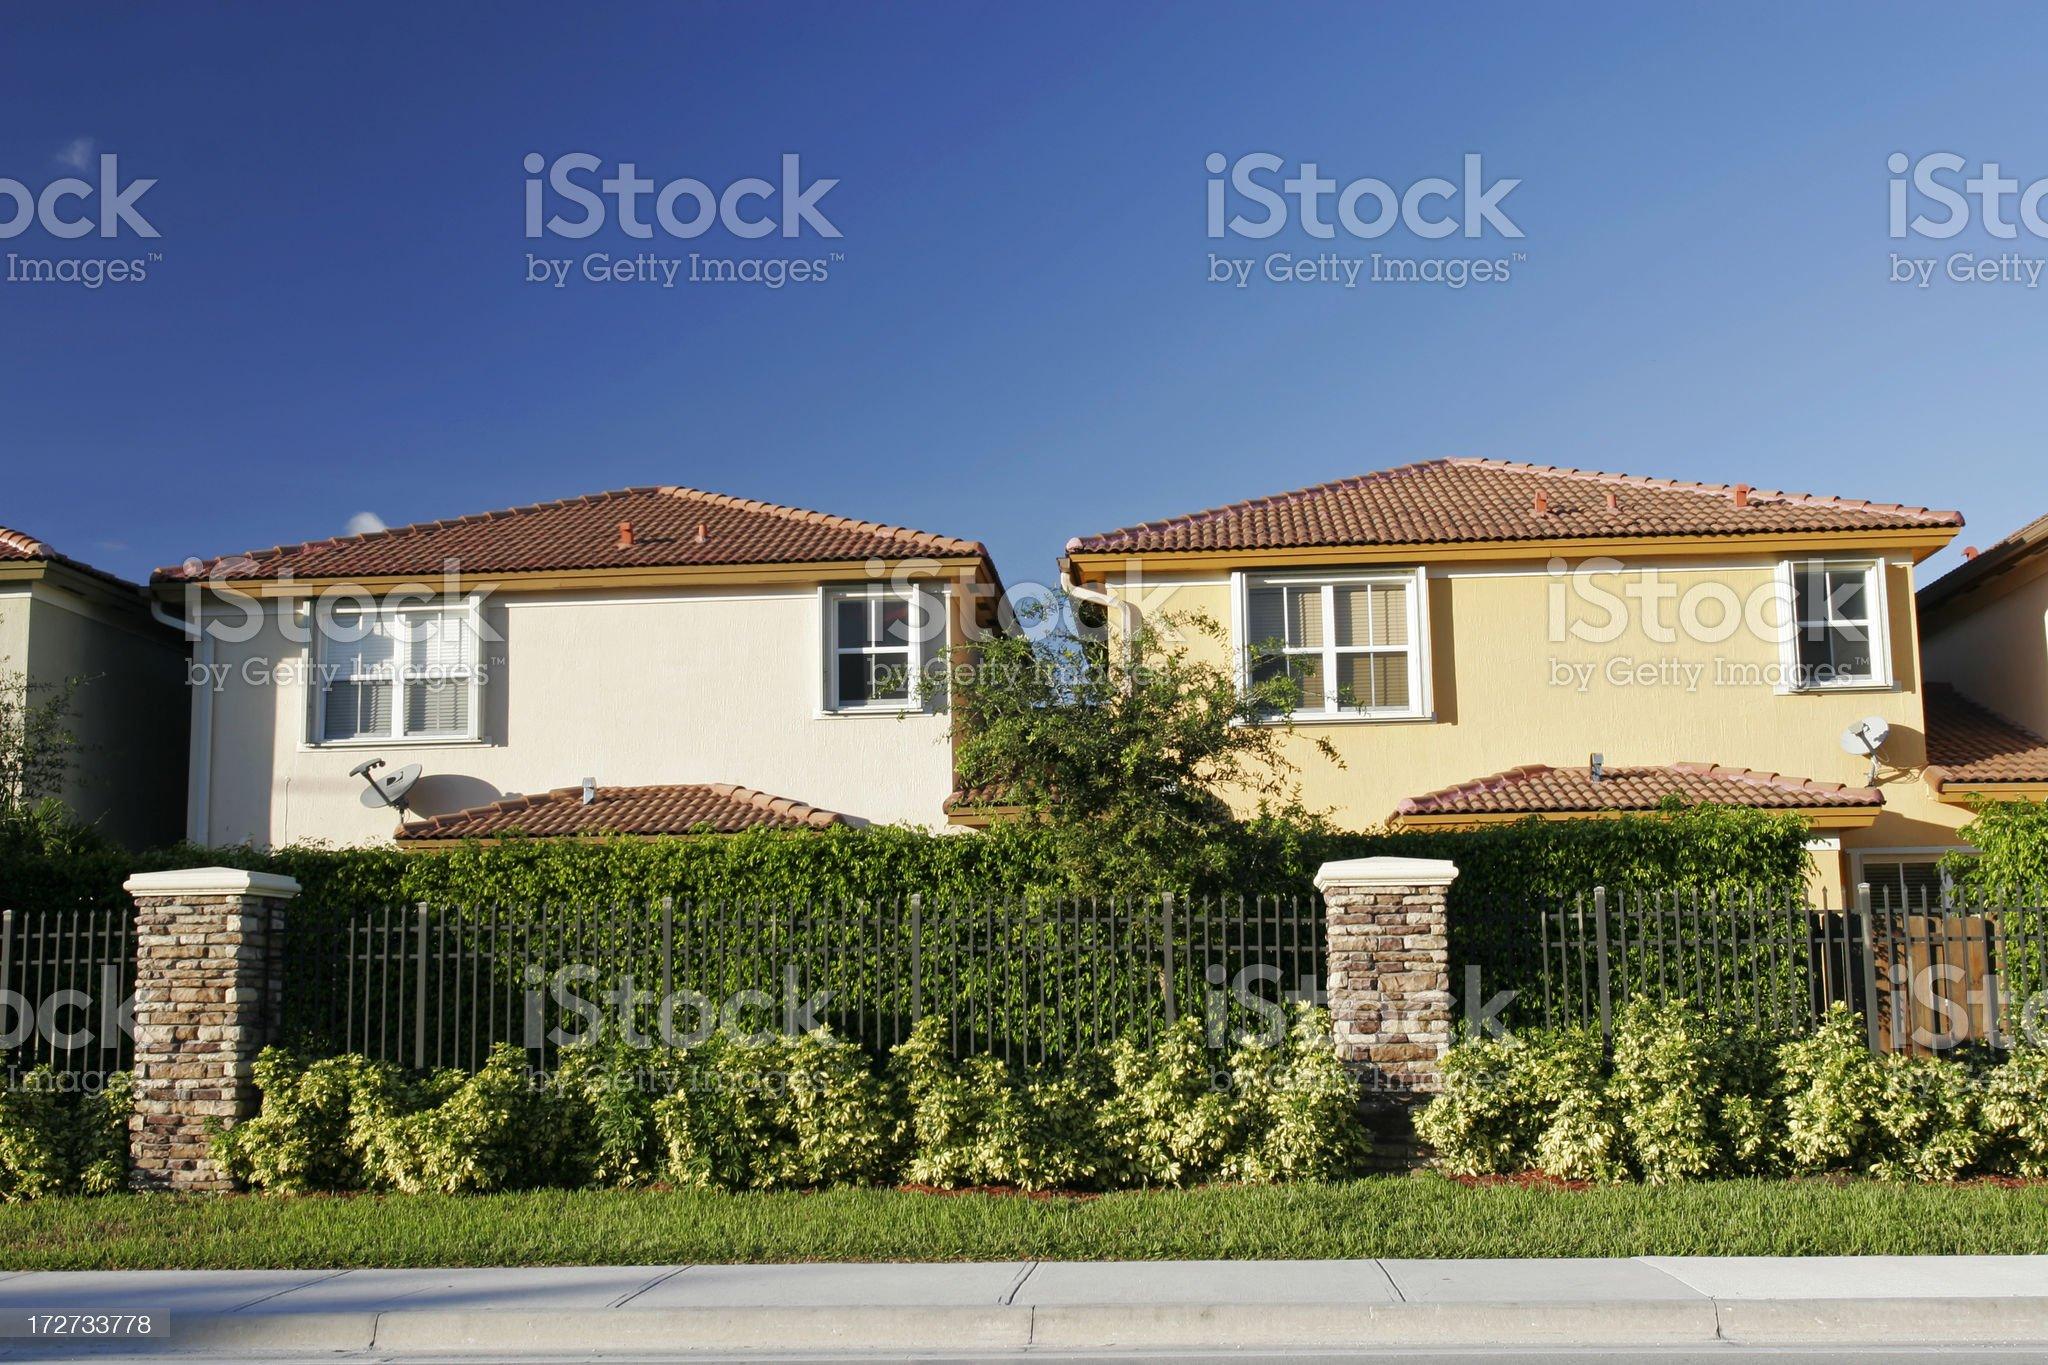 Single Family Houses royalty-free stock photo